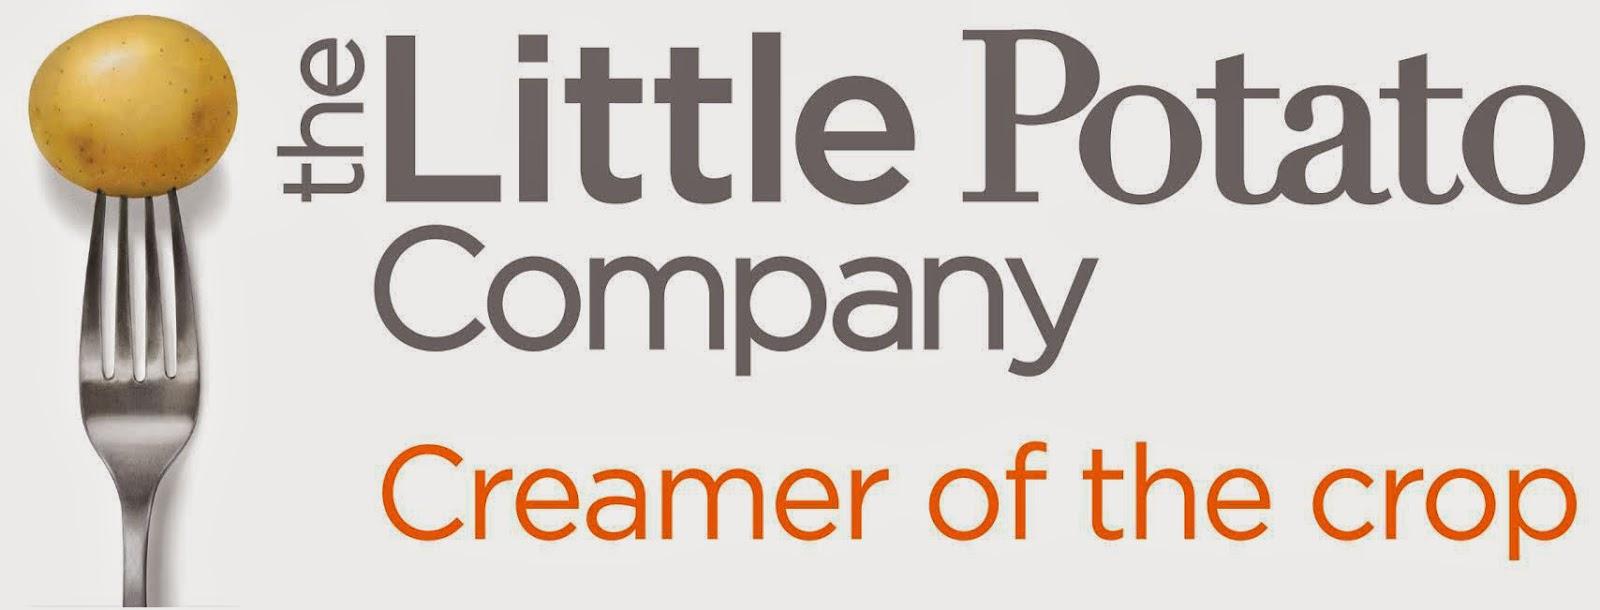 Brand Ambassador for The Little Potato Company